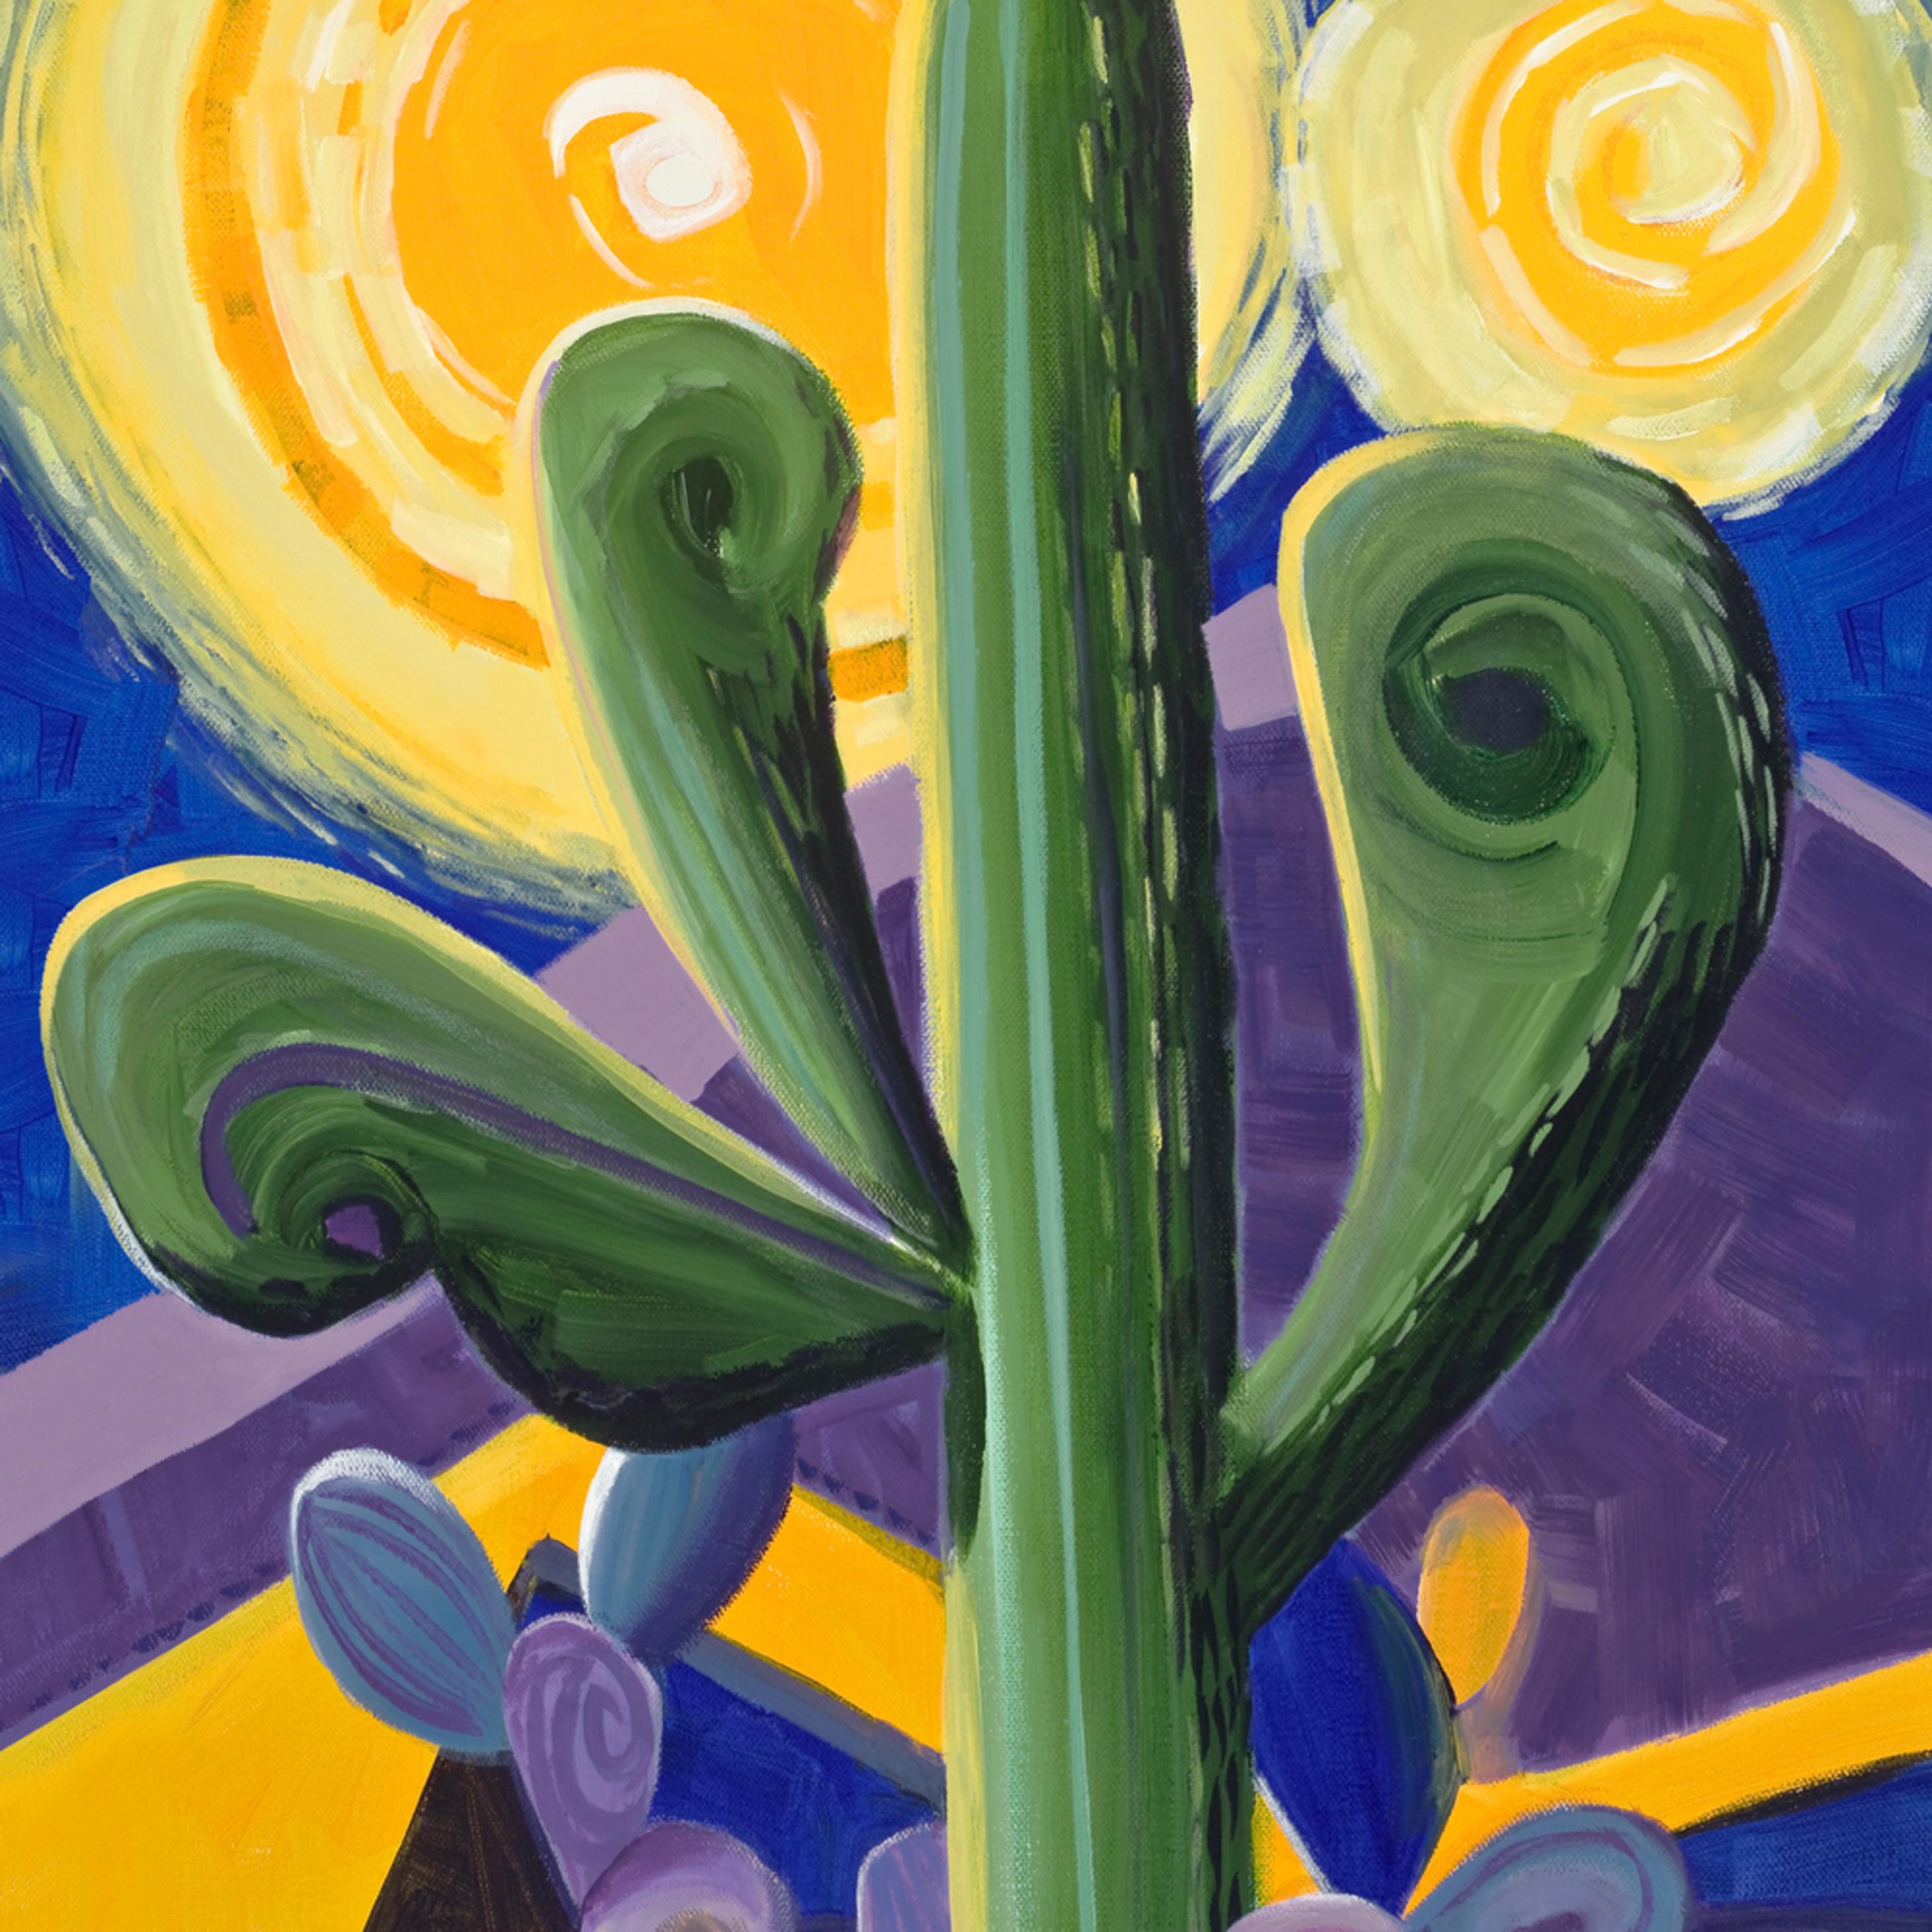 Saguaro van gogh xxms tcp655